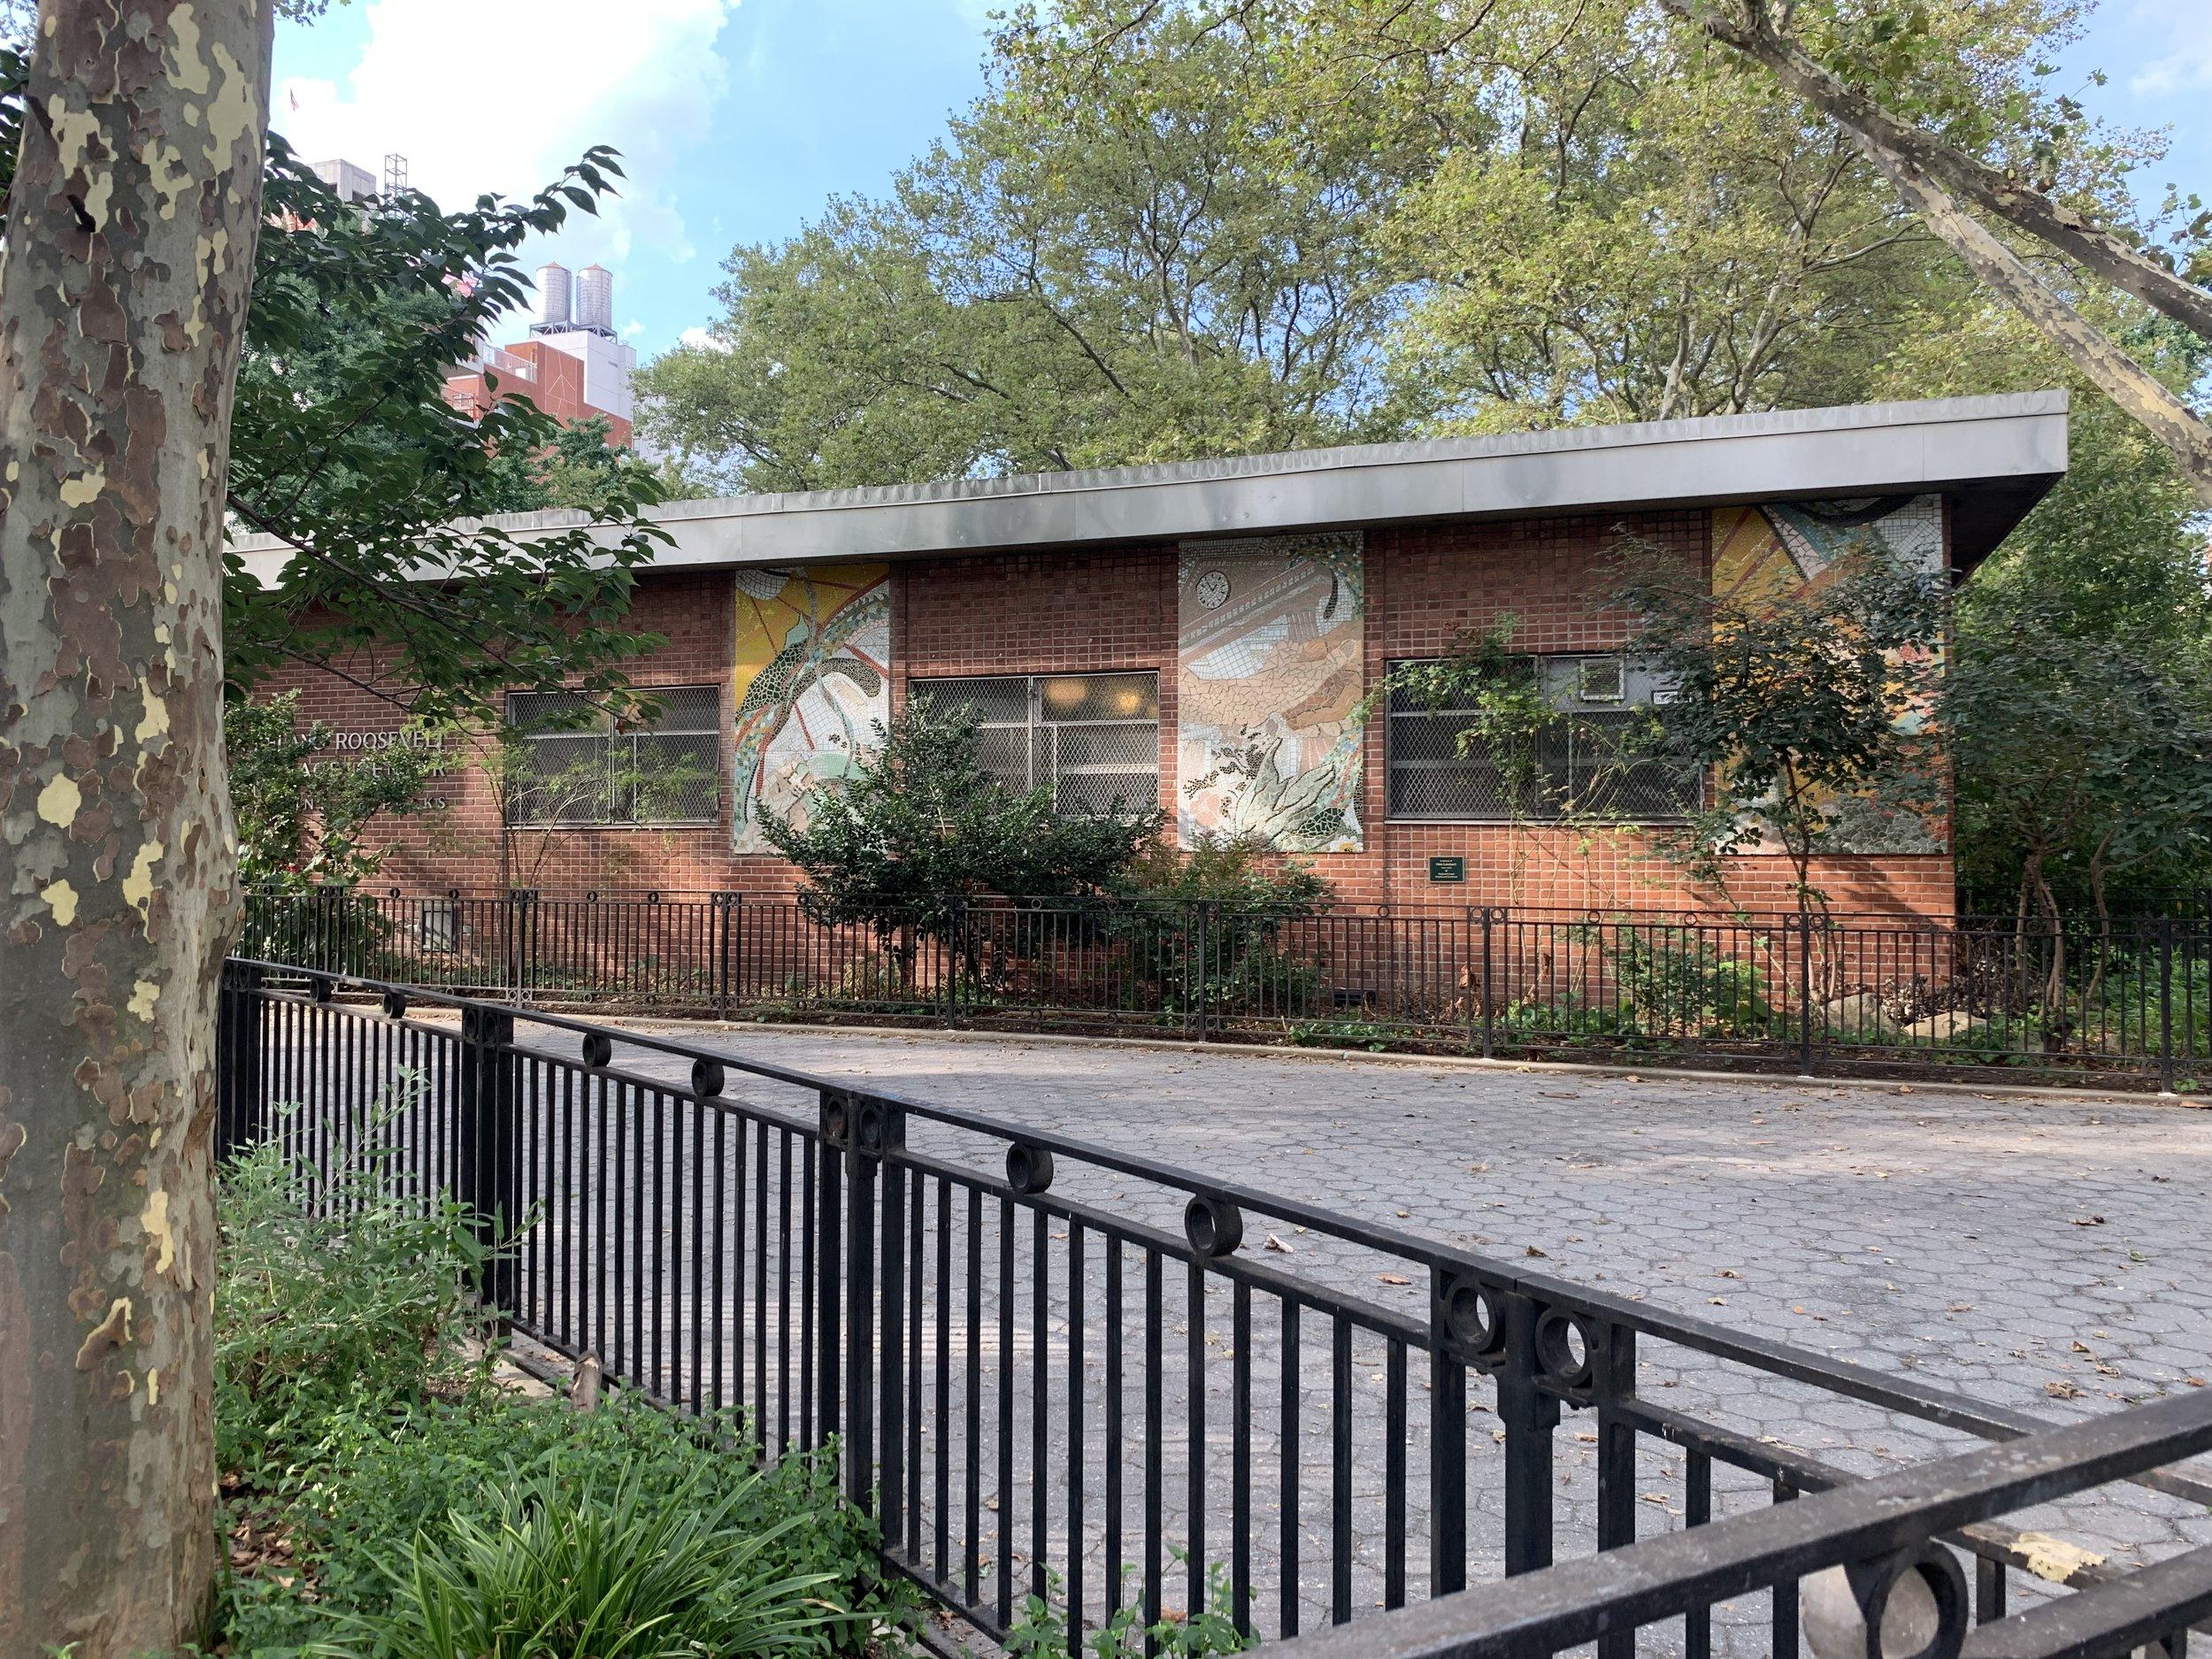 Sara D. Roosevelt Park